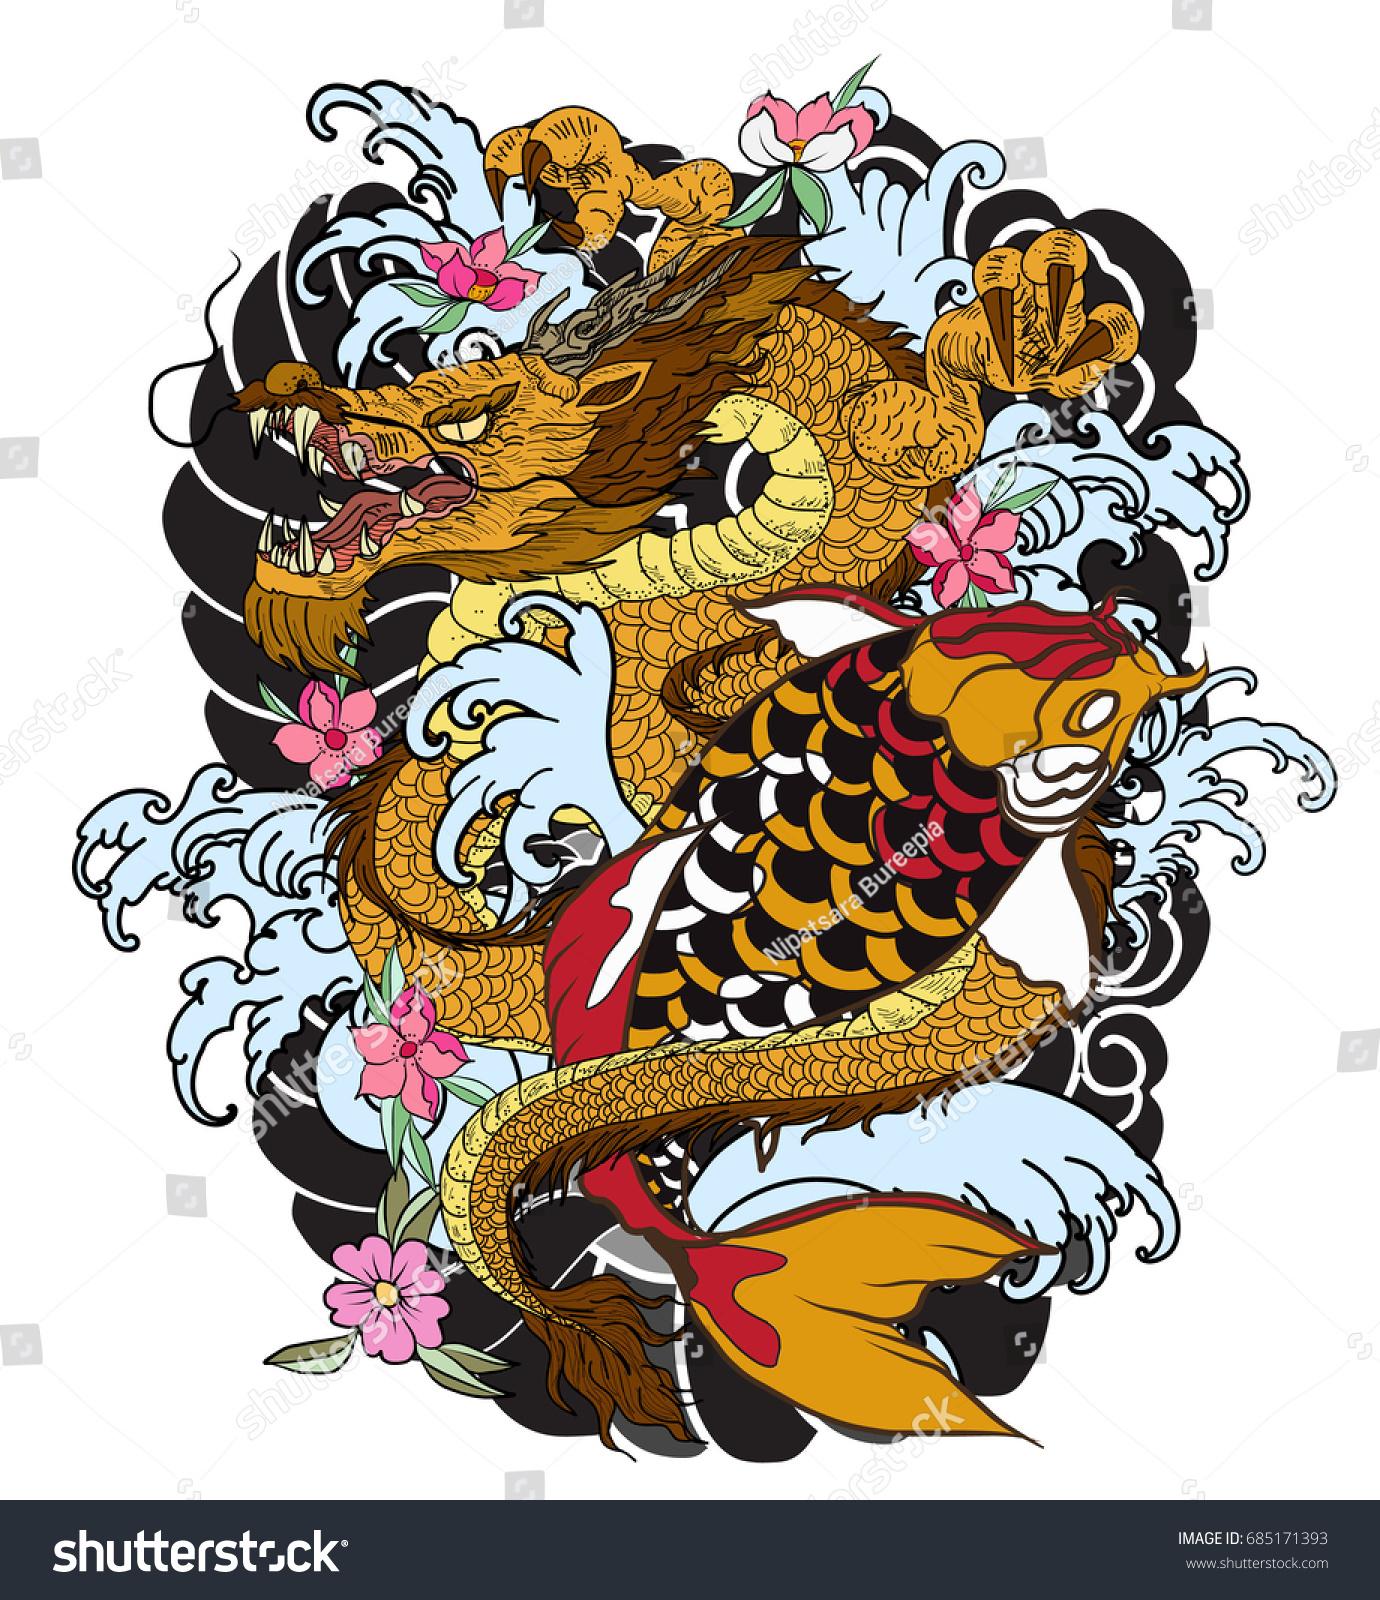 hand drawn dragon koi fish flower stock vector 685171393 shutterstock. Black Bedroom Furniture Sets. Home Design Ideas